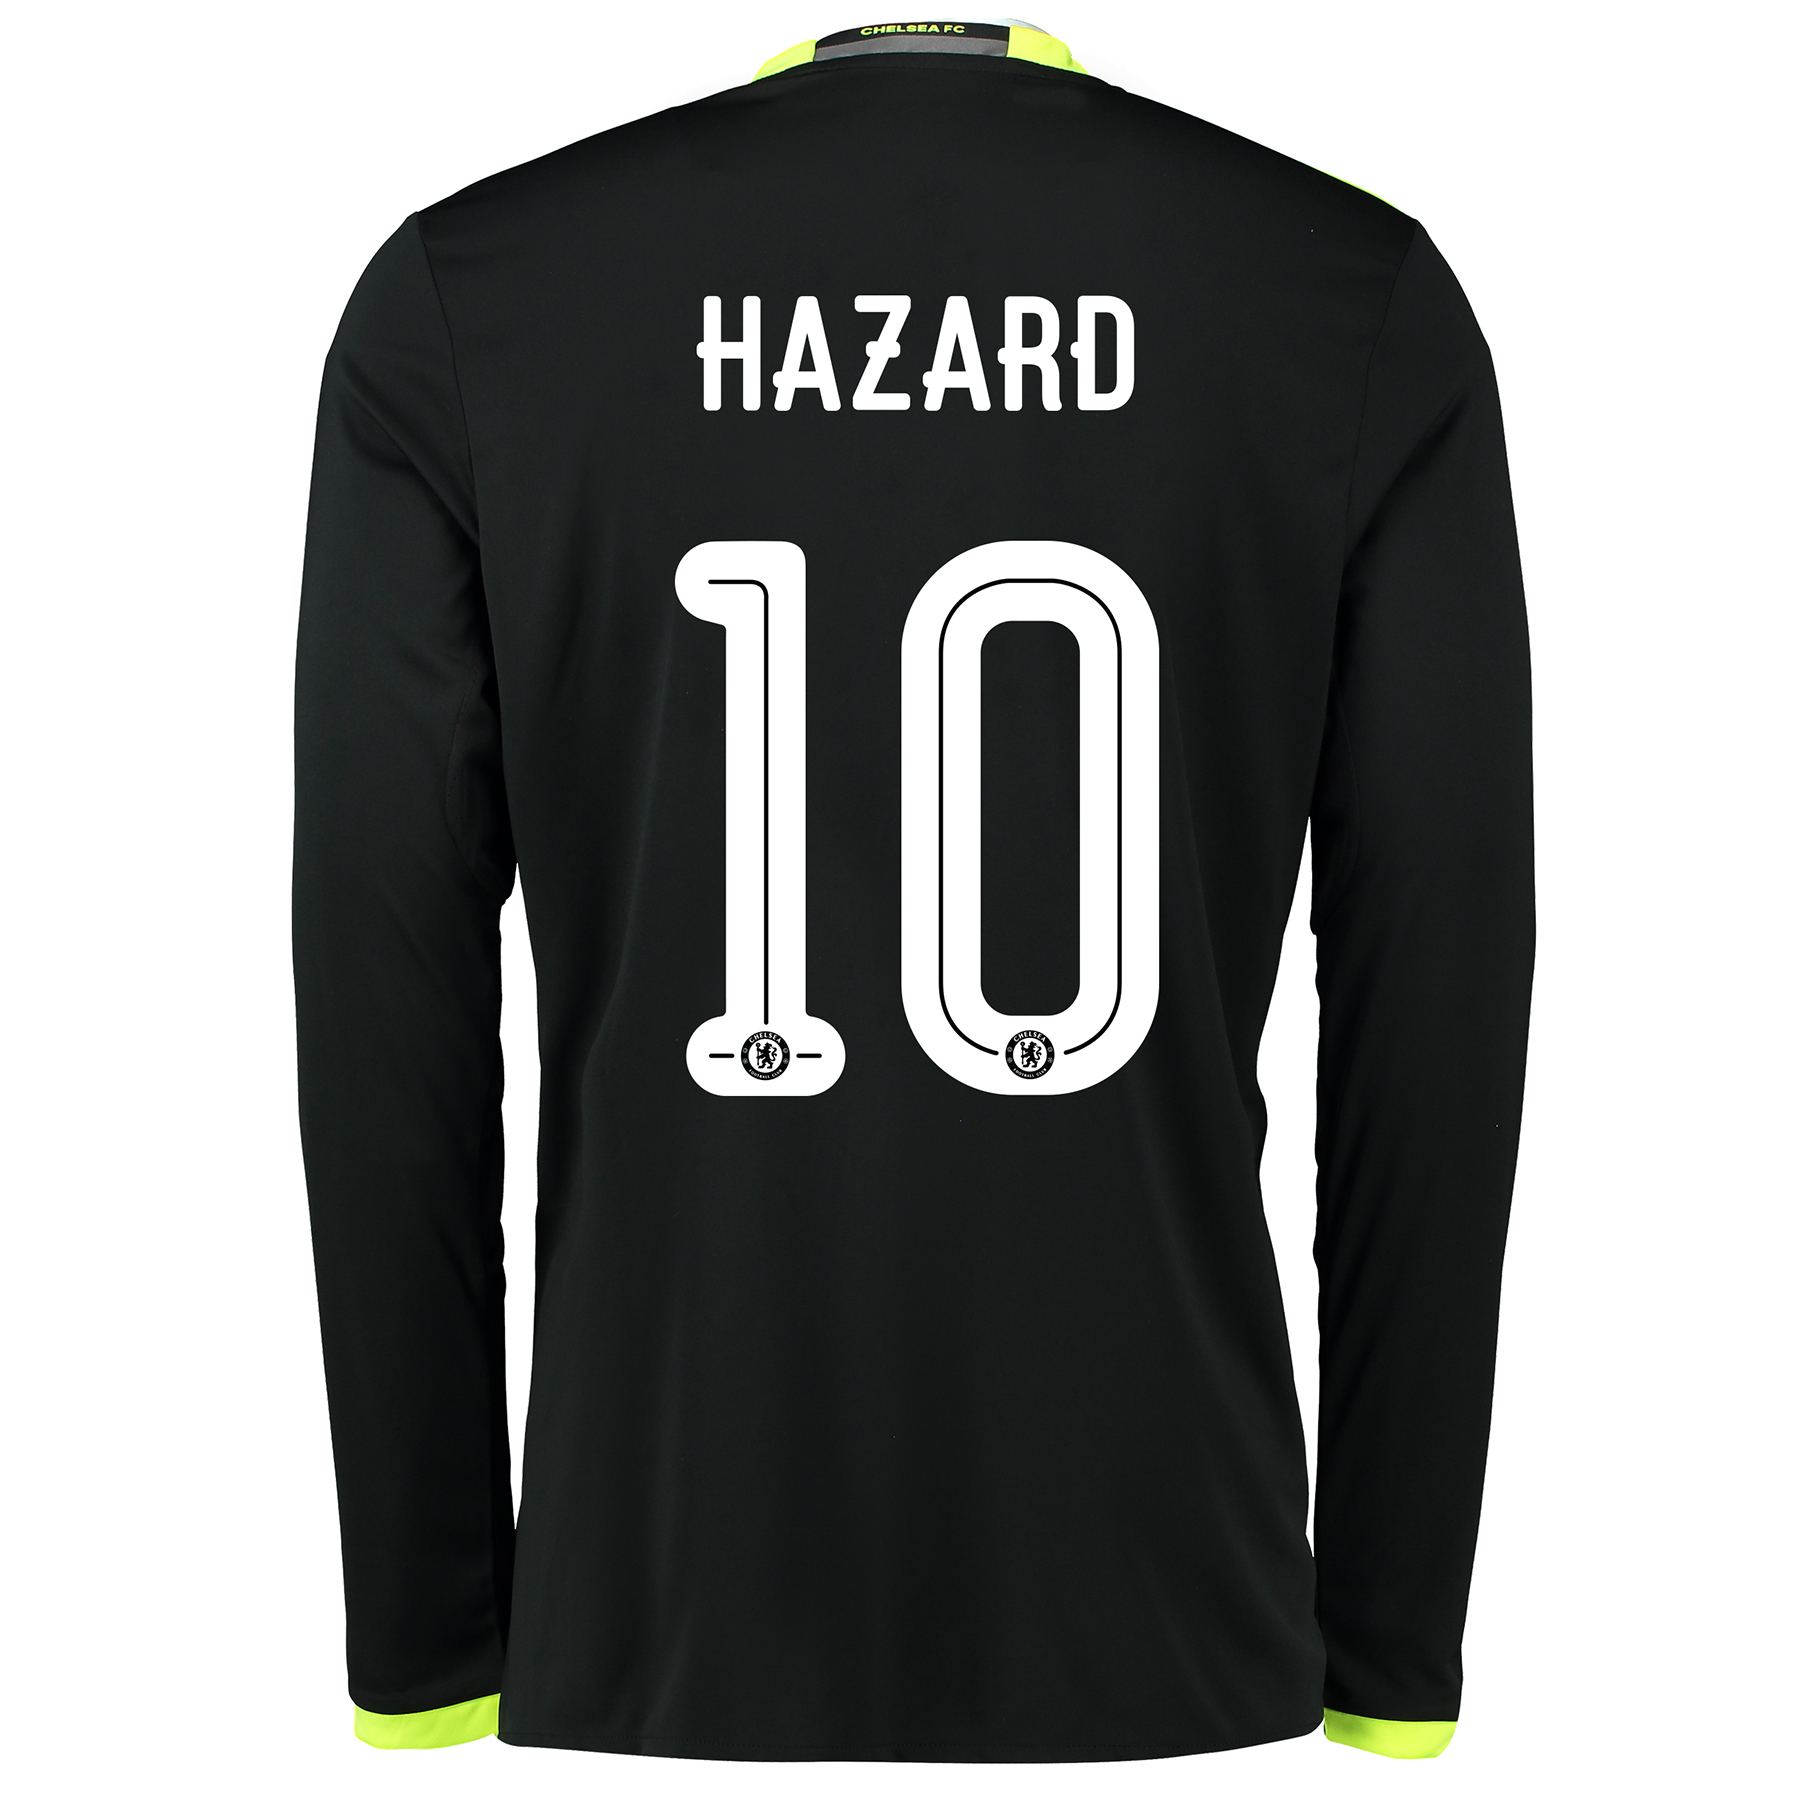 Chelsea Linear Away Shirt 16-17 - Long Sleeve with Hazard 10 printing